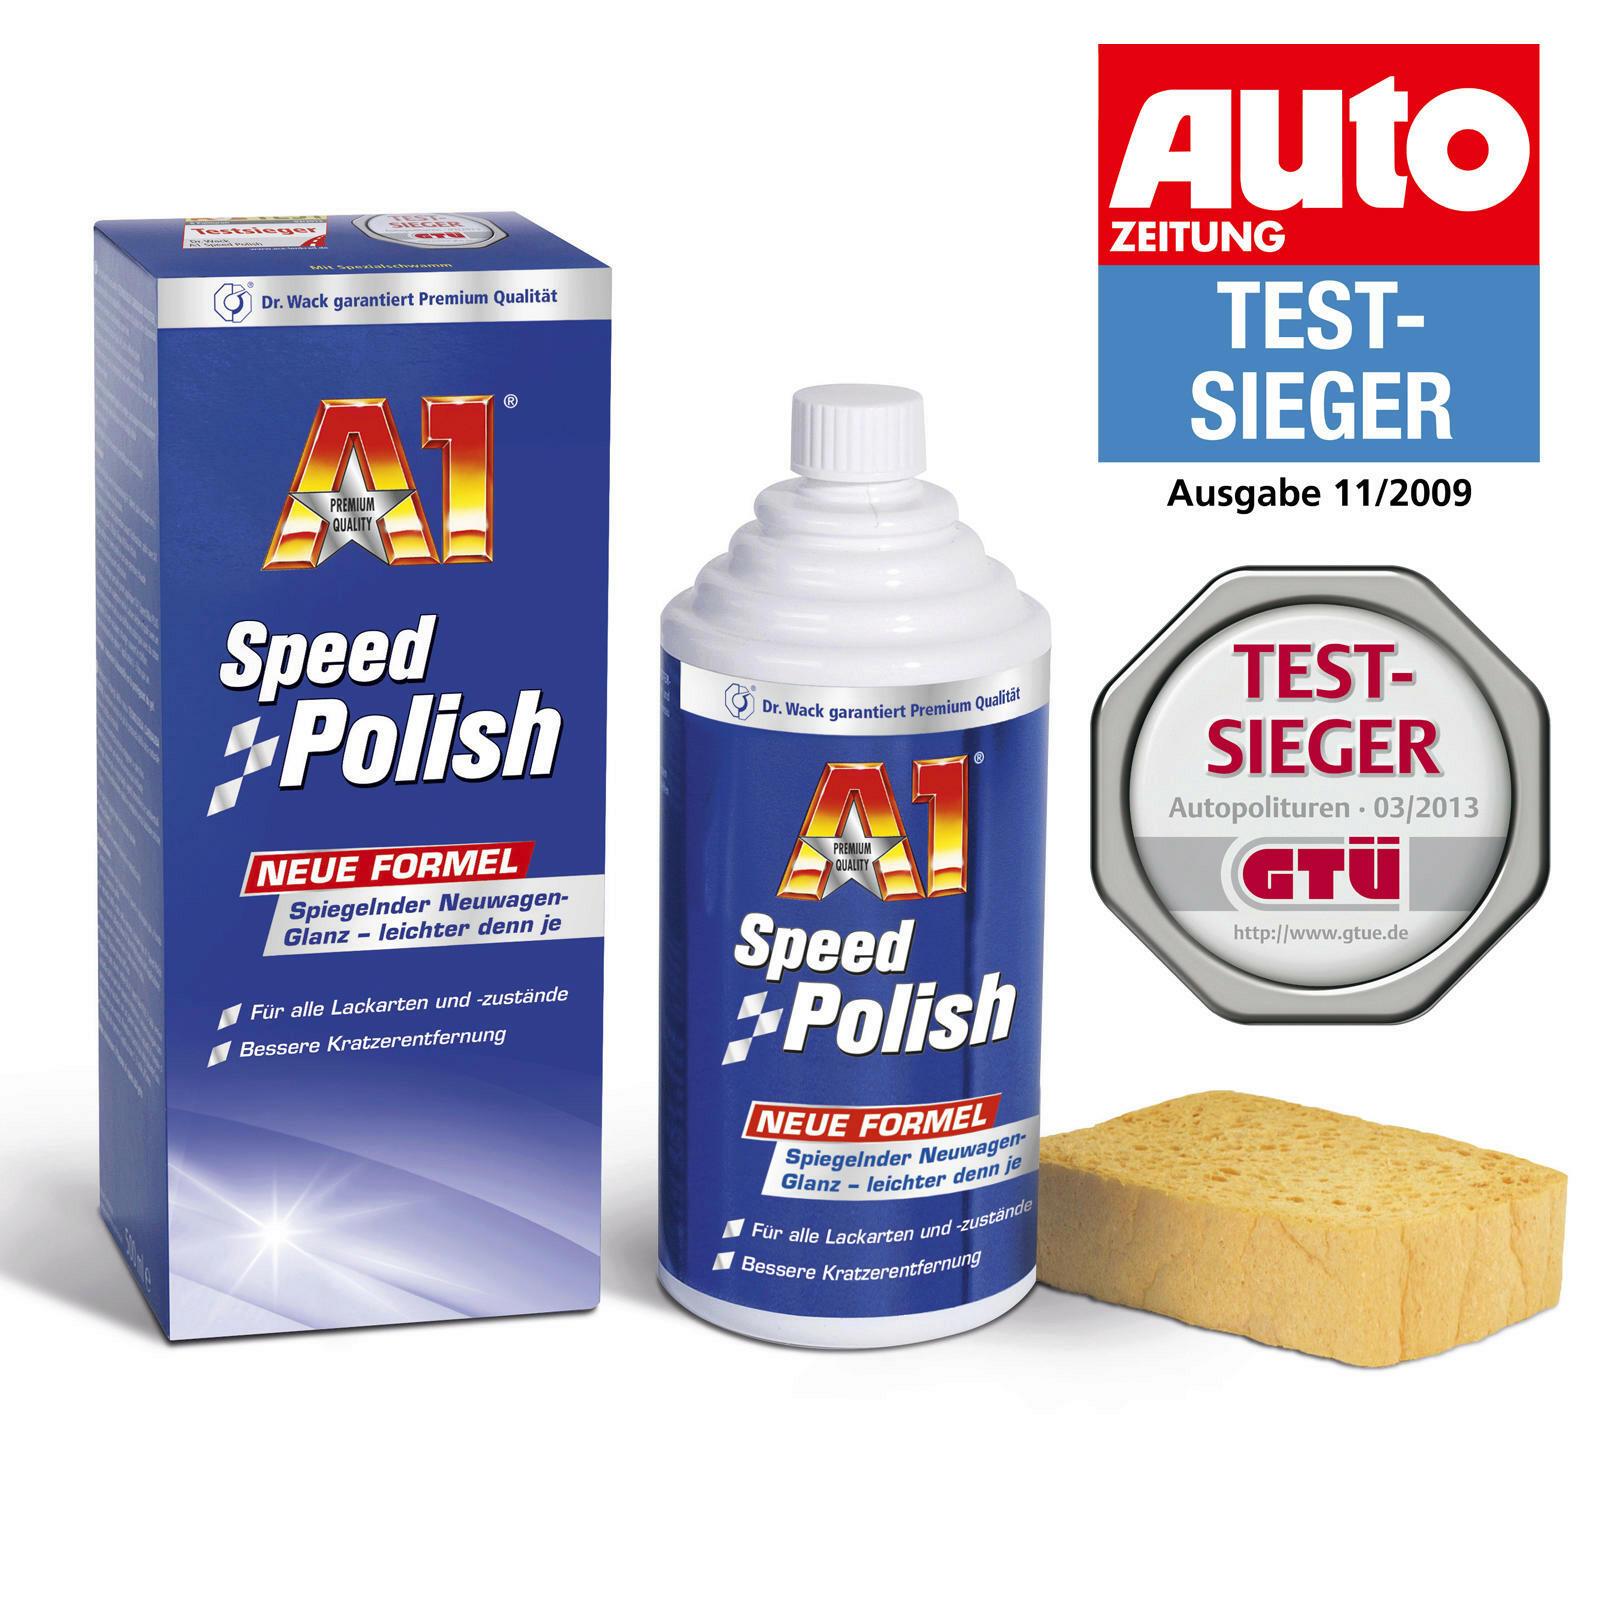 Dr.Wack A1 Speed Polish 500ml + Mannol Microfasertuch